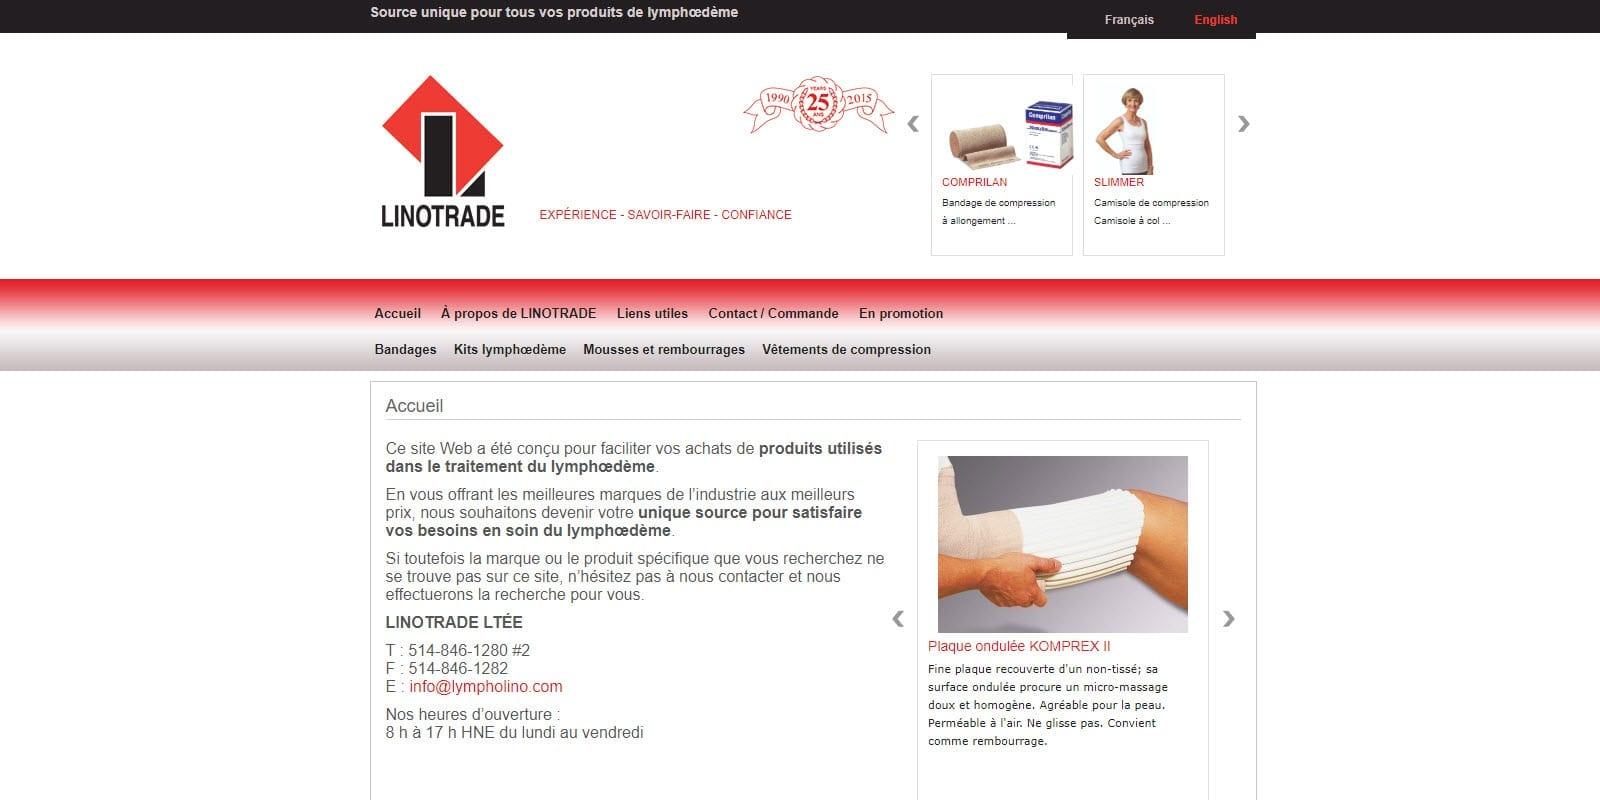 lympholino.com